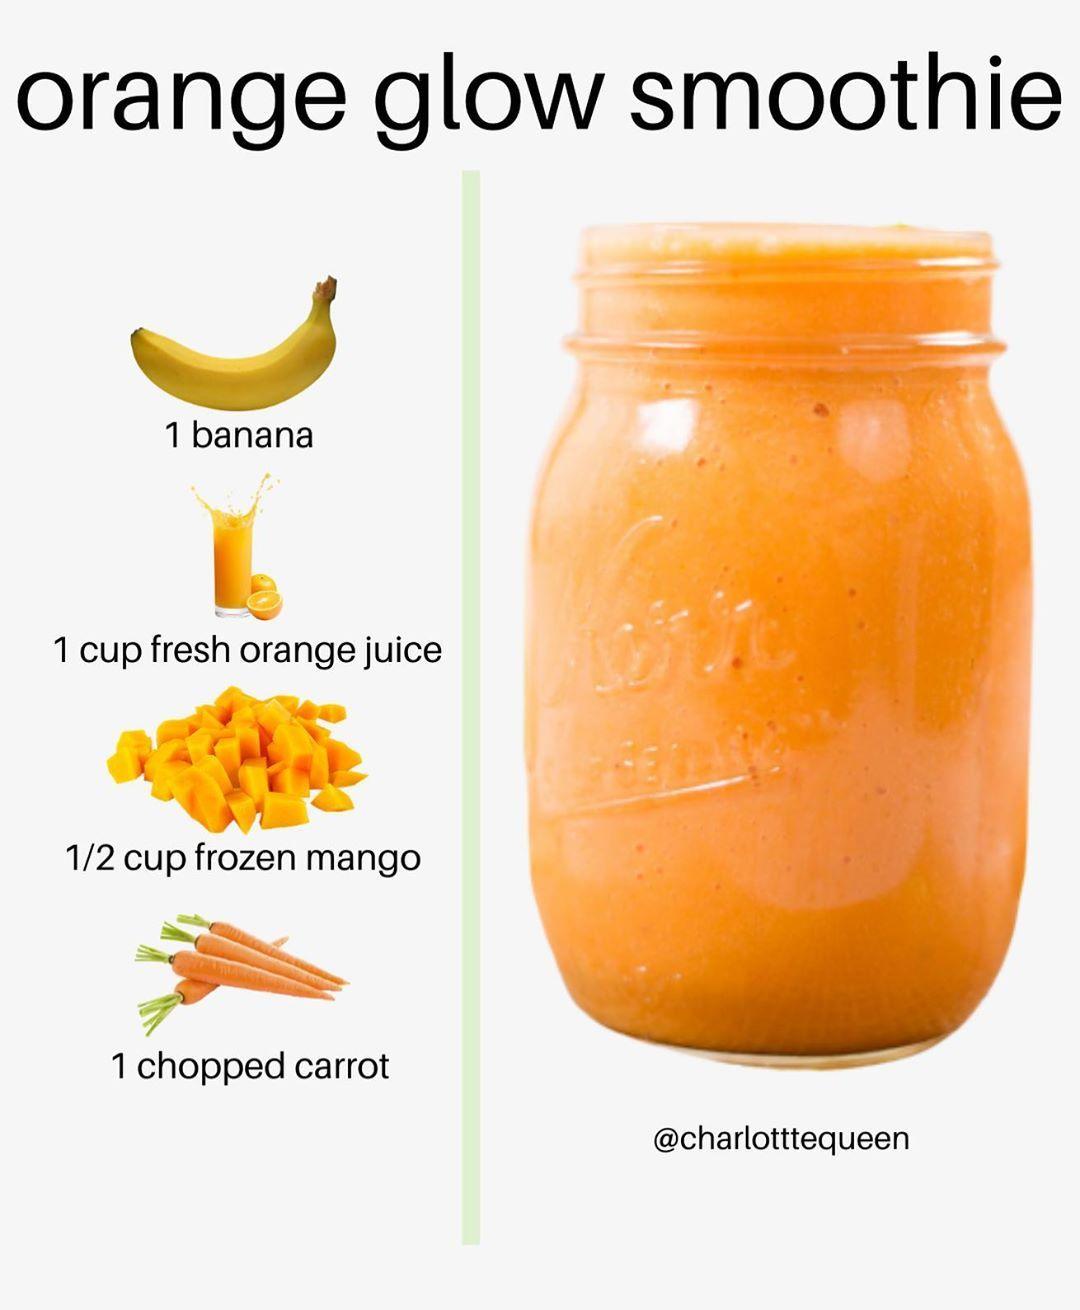 Charlotte Queen S Instagram Post Glowing Orange Smoothie Charlotttequeen Are Yo Healthy Snacks Recipes Smoothie Drink Recipes Smoothie Recipes Healthy